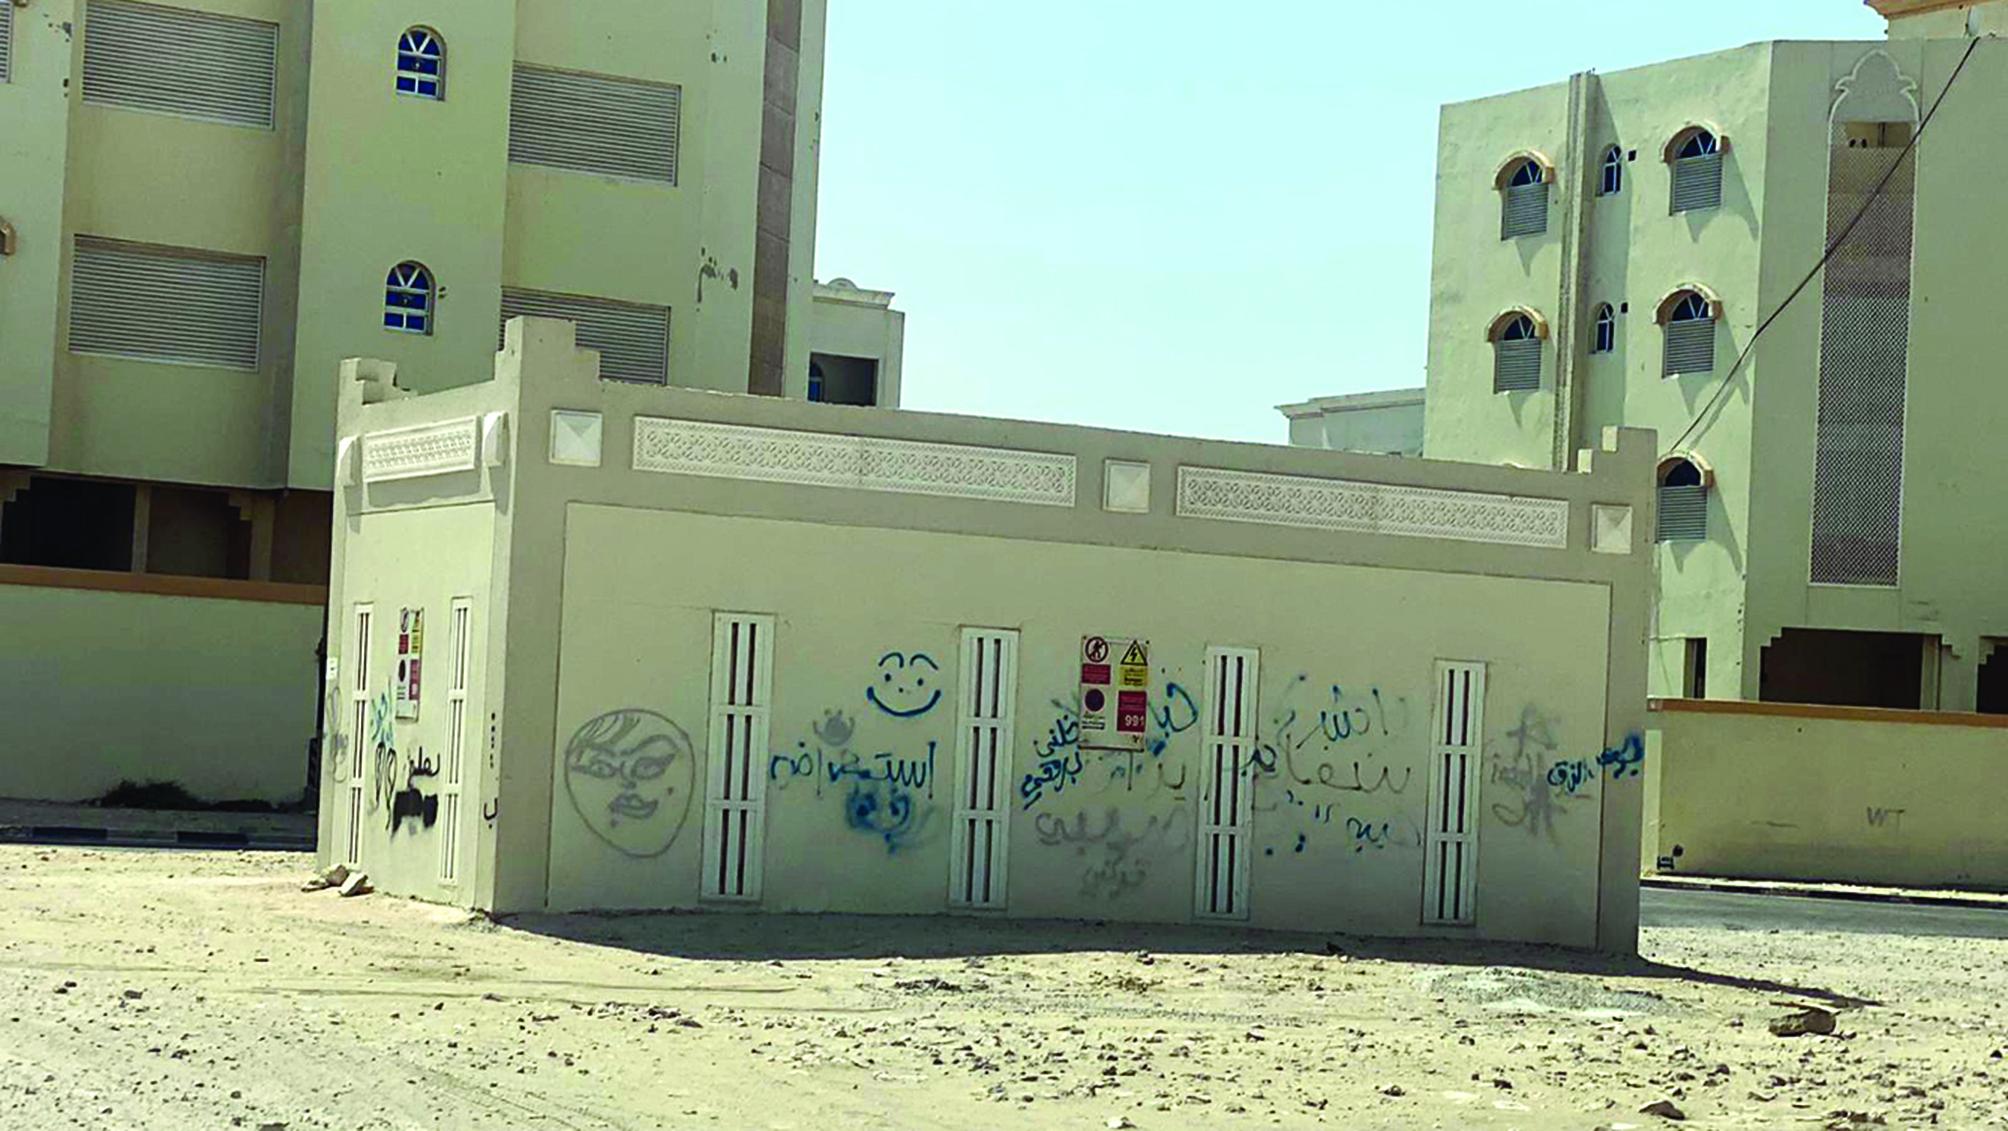 Graffiti distorts public facilities